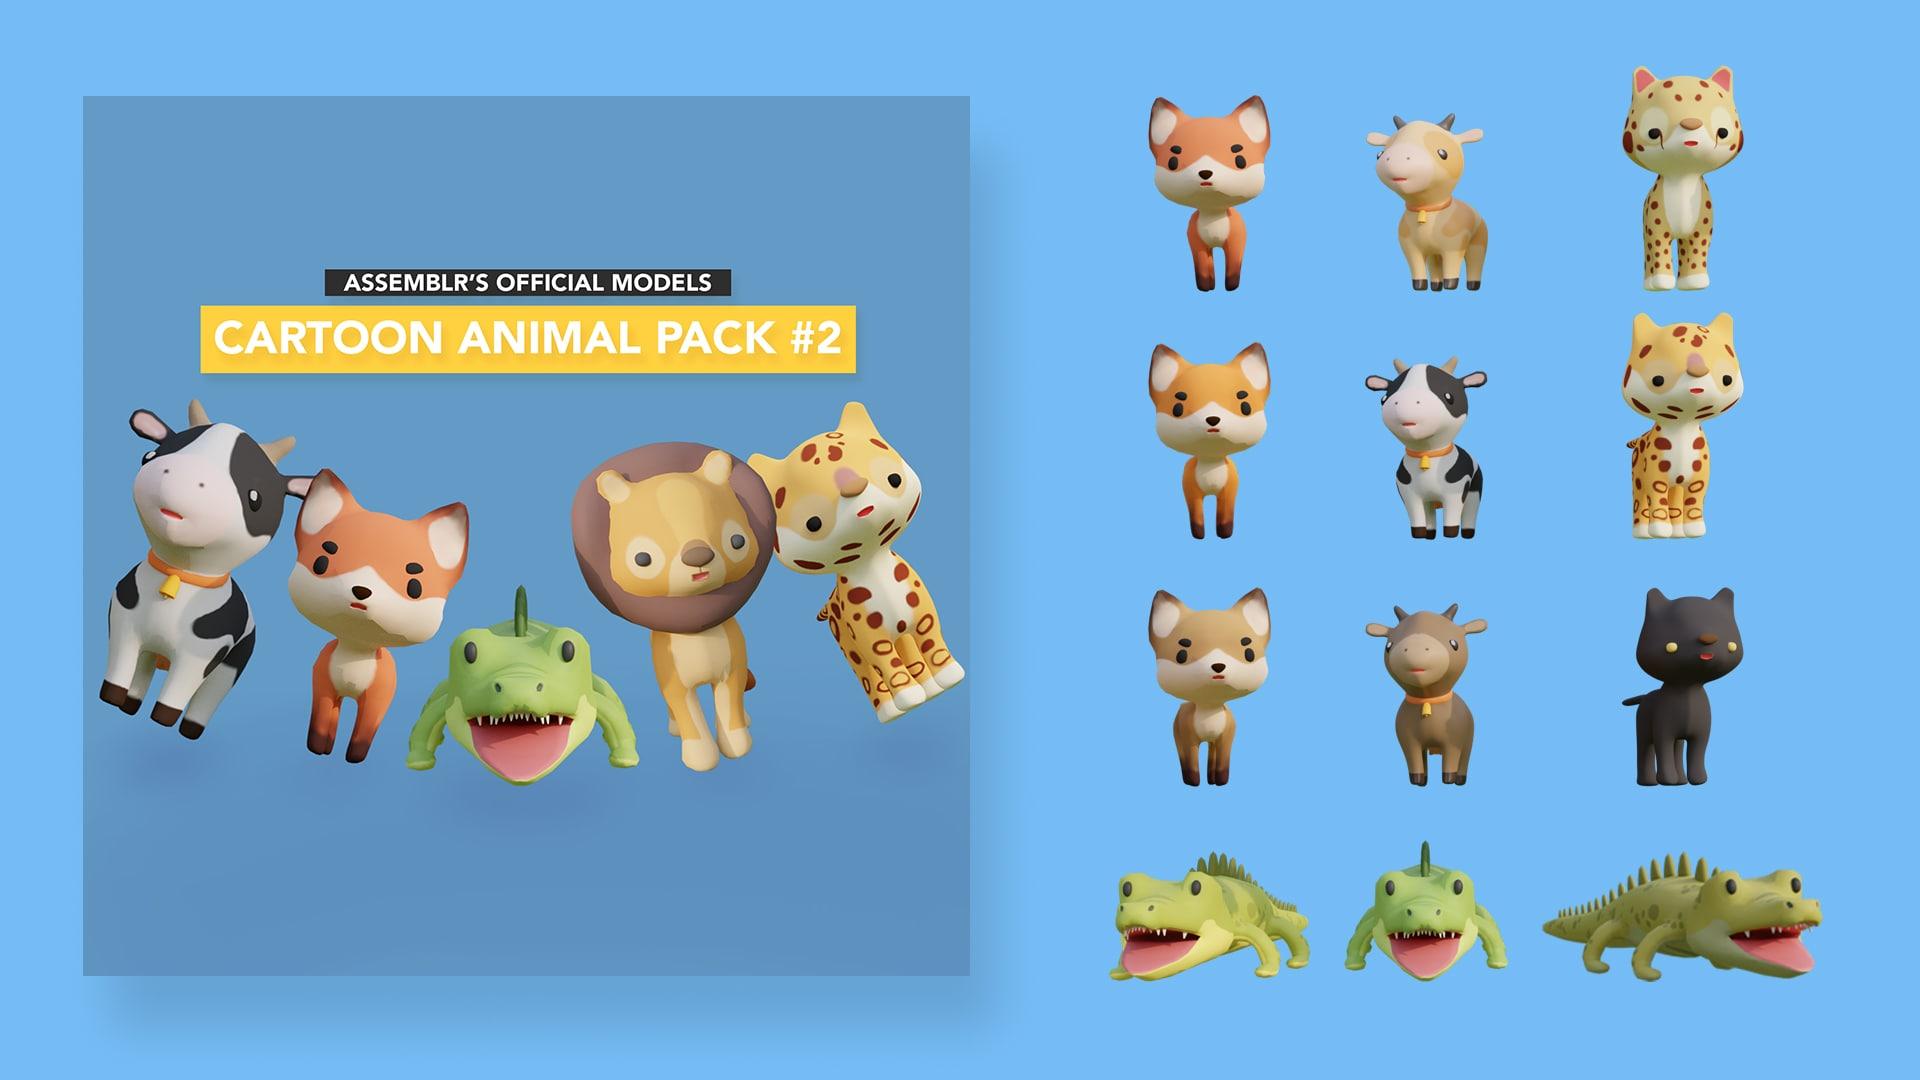 Cartoon animal pack #2